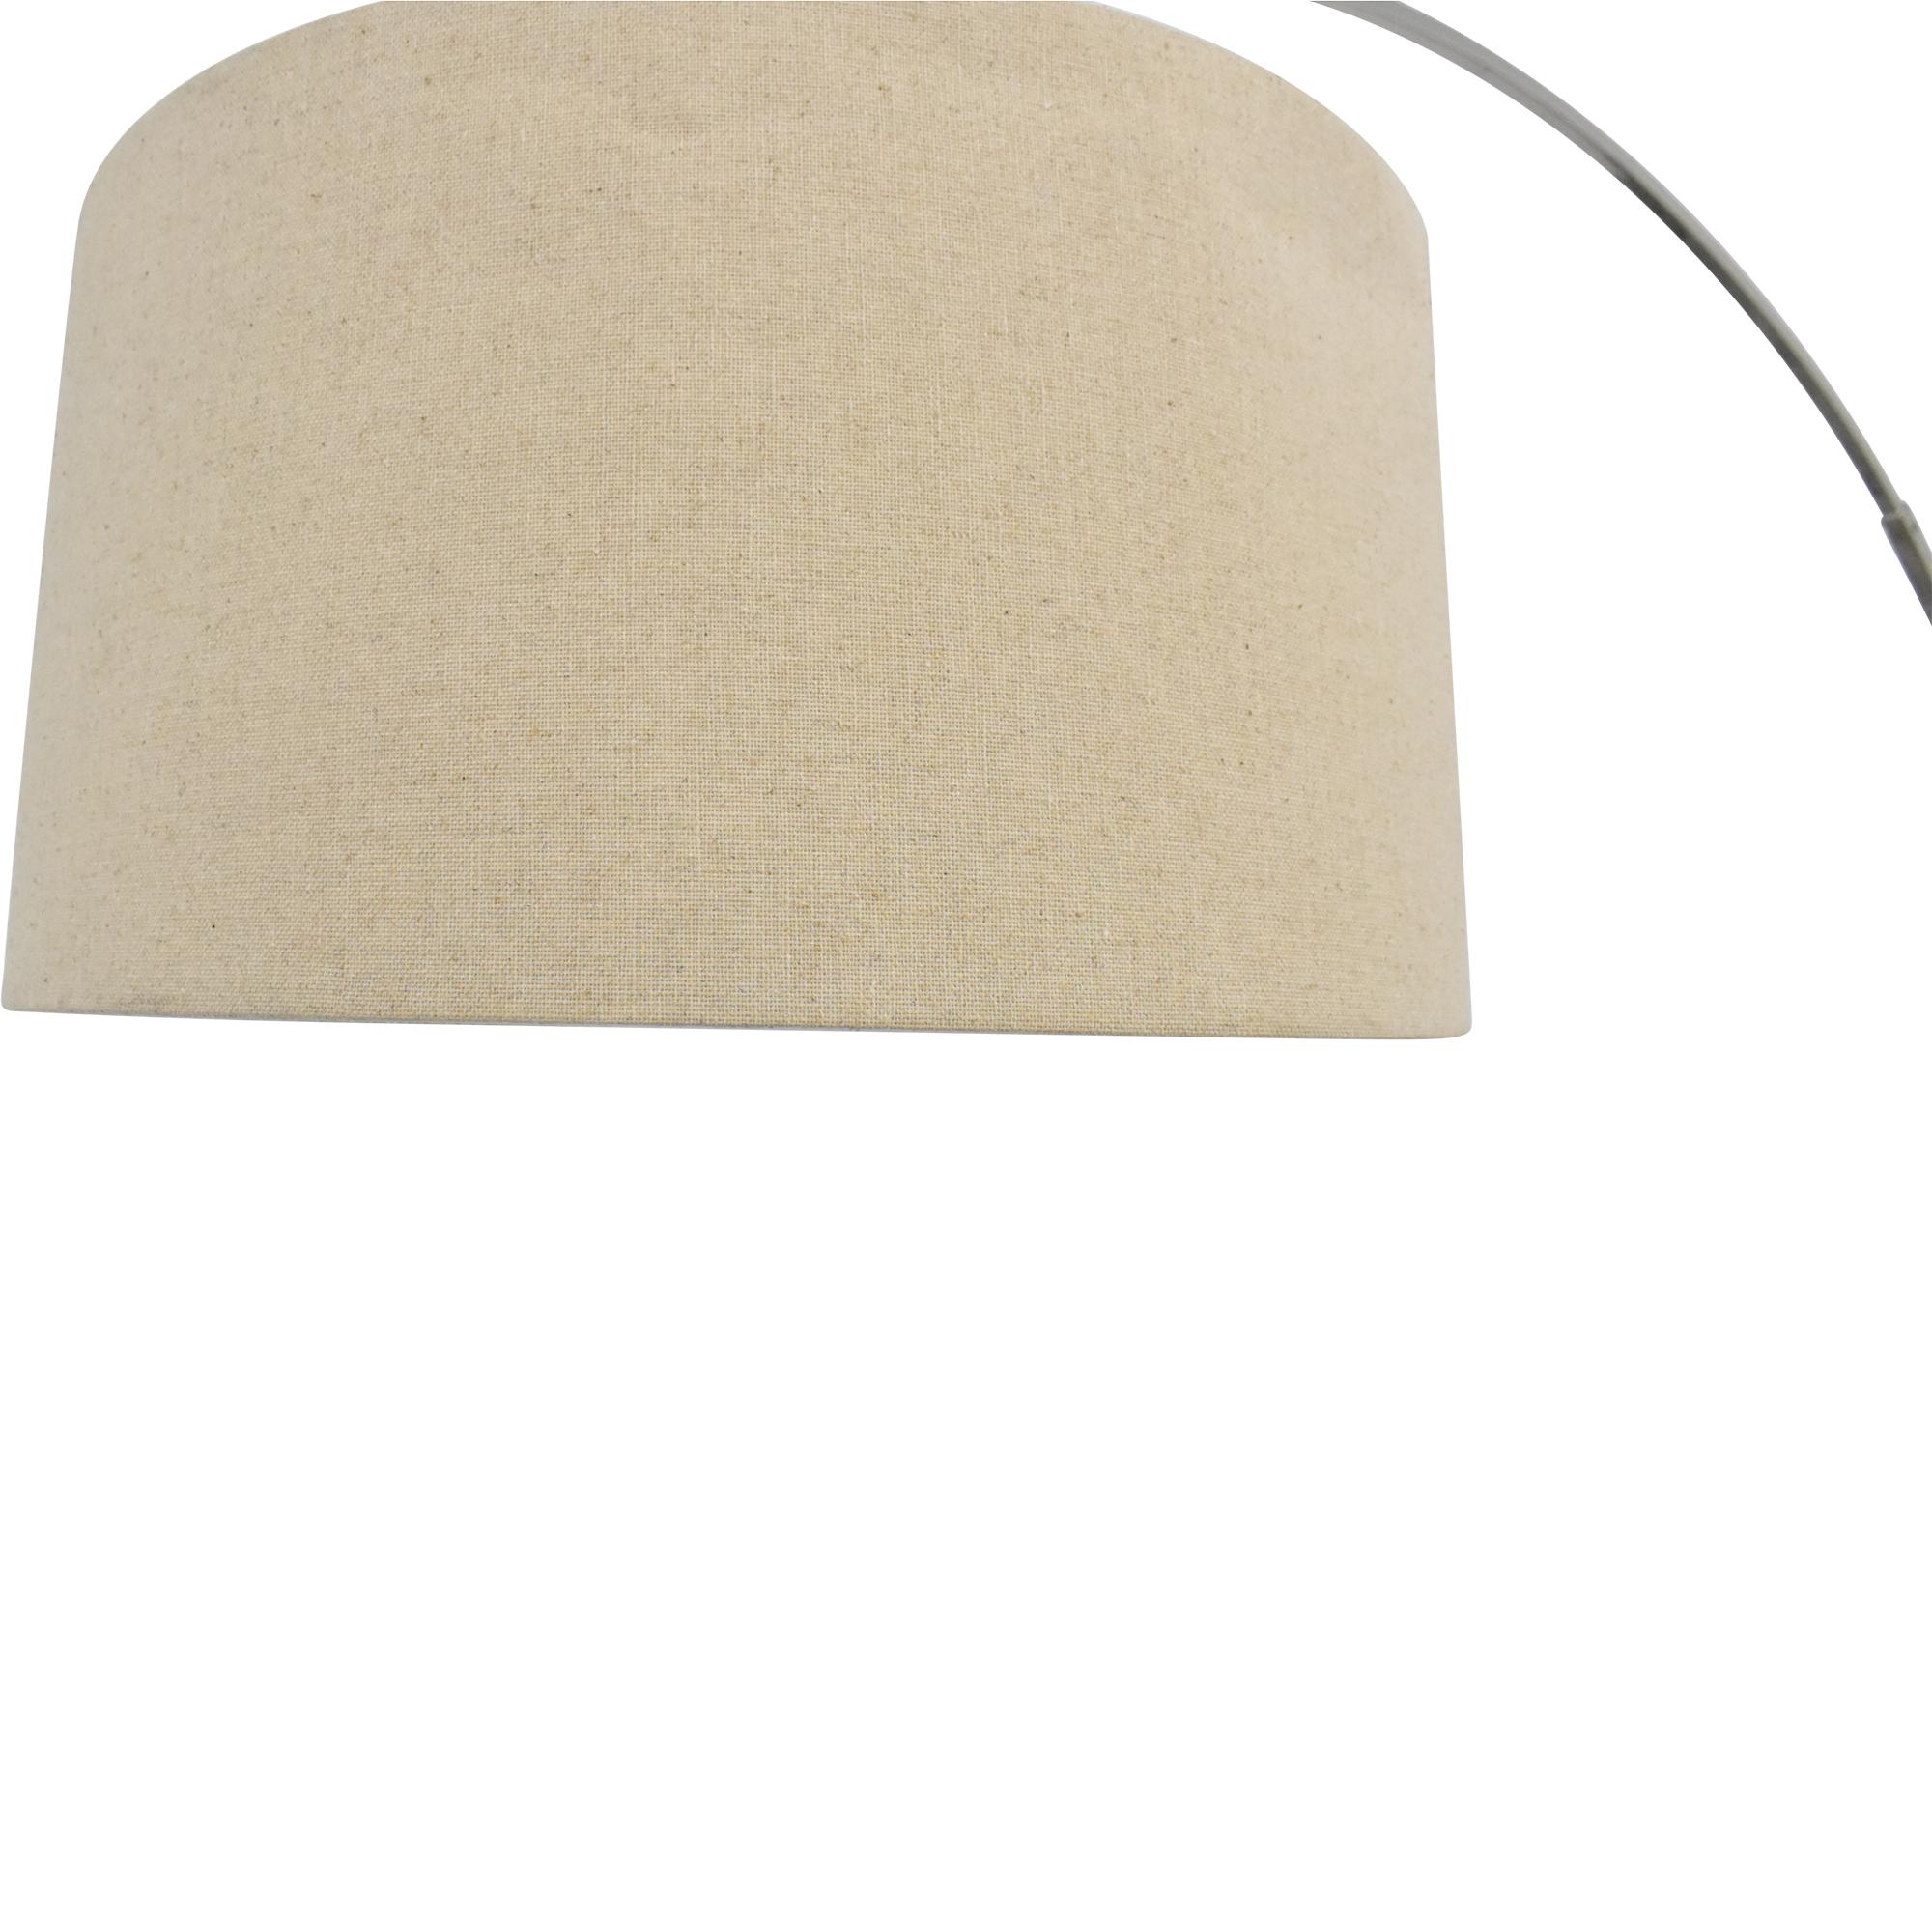 West Elm West Elm Overarching Floor Lamp